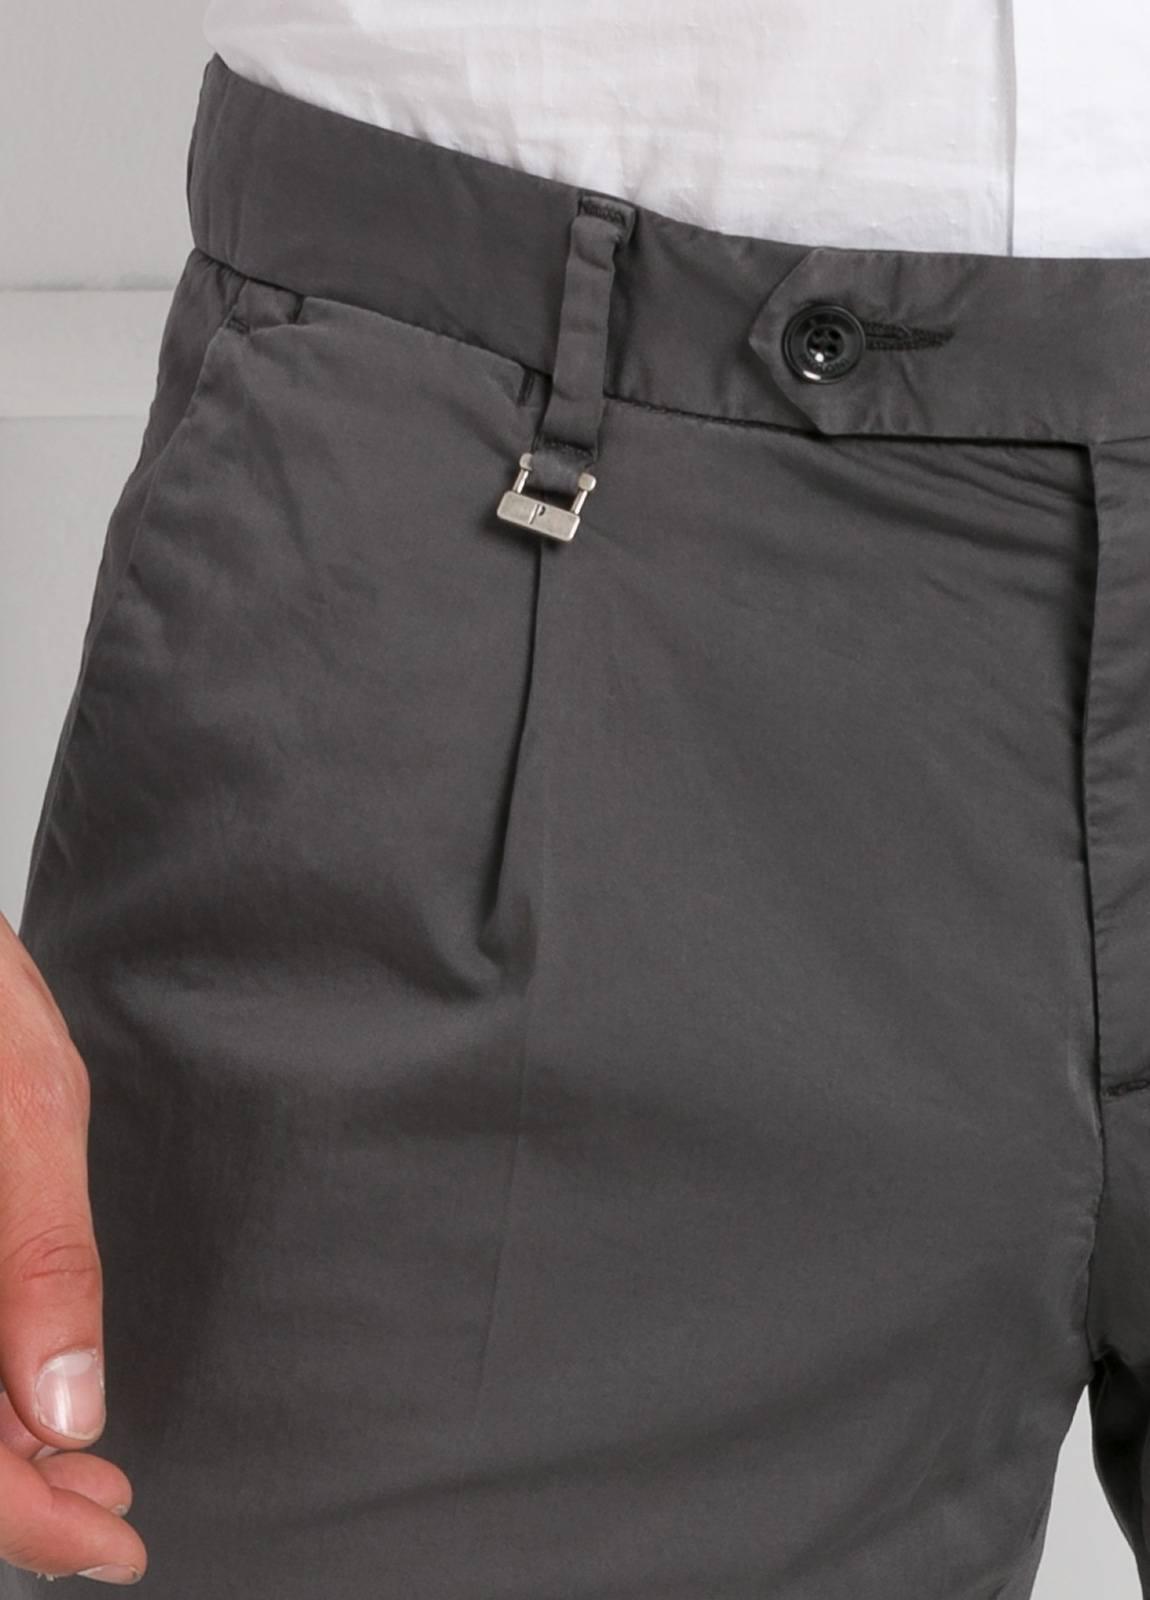 Pantalón modelo slim fit 1 pinza color gris oscuro. 97% Algodón 3% Ea. - Ítem3